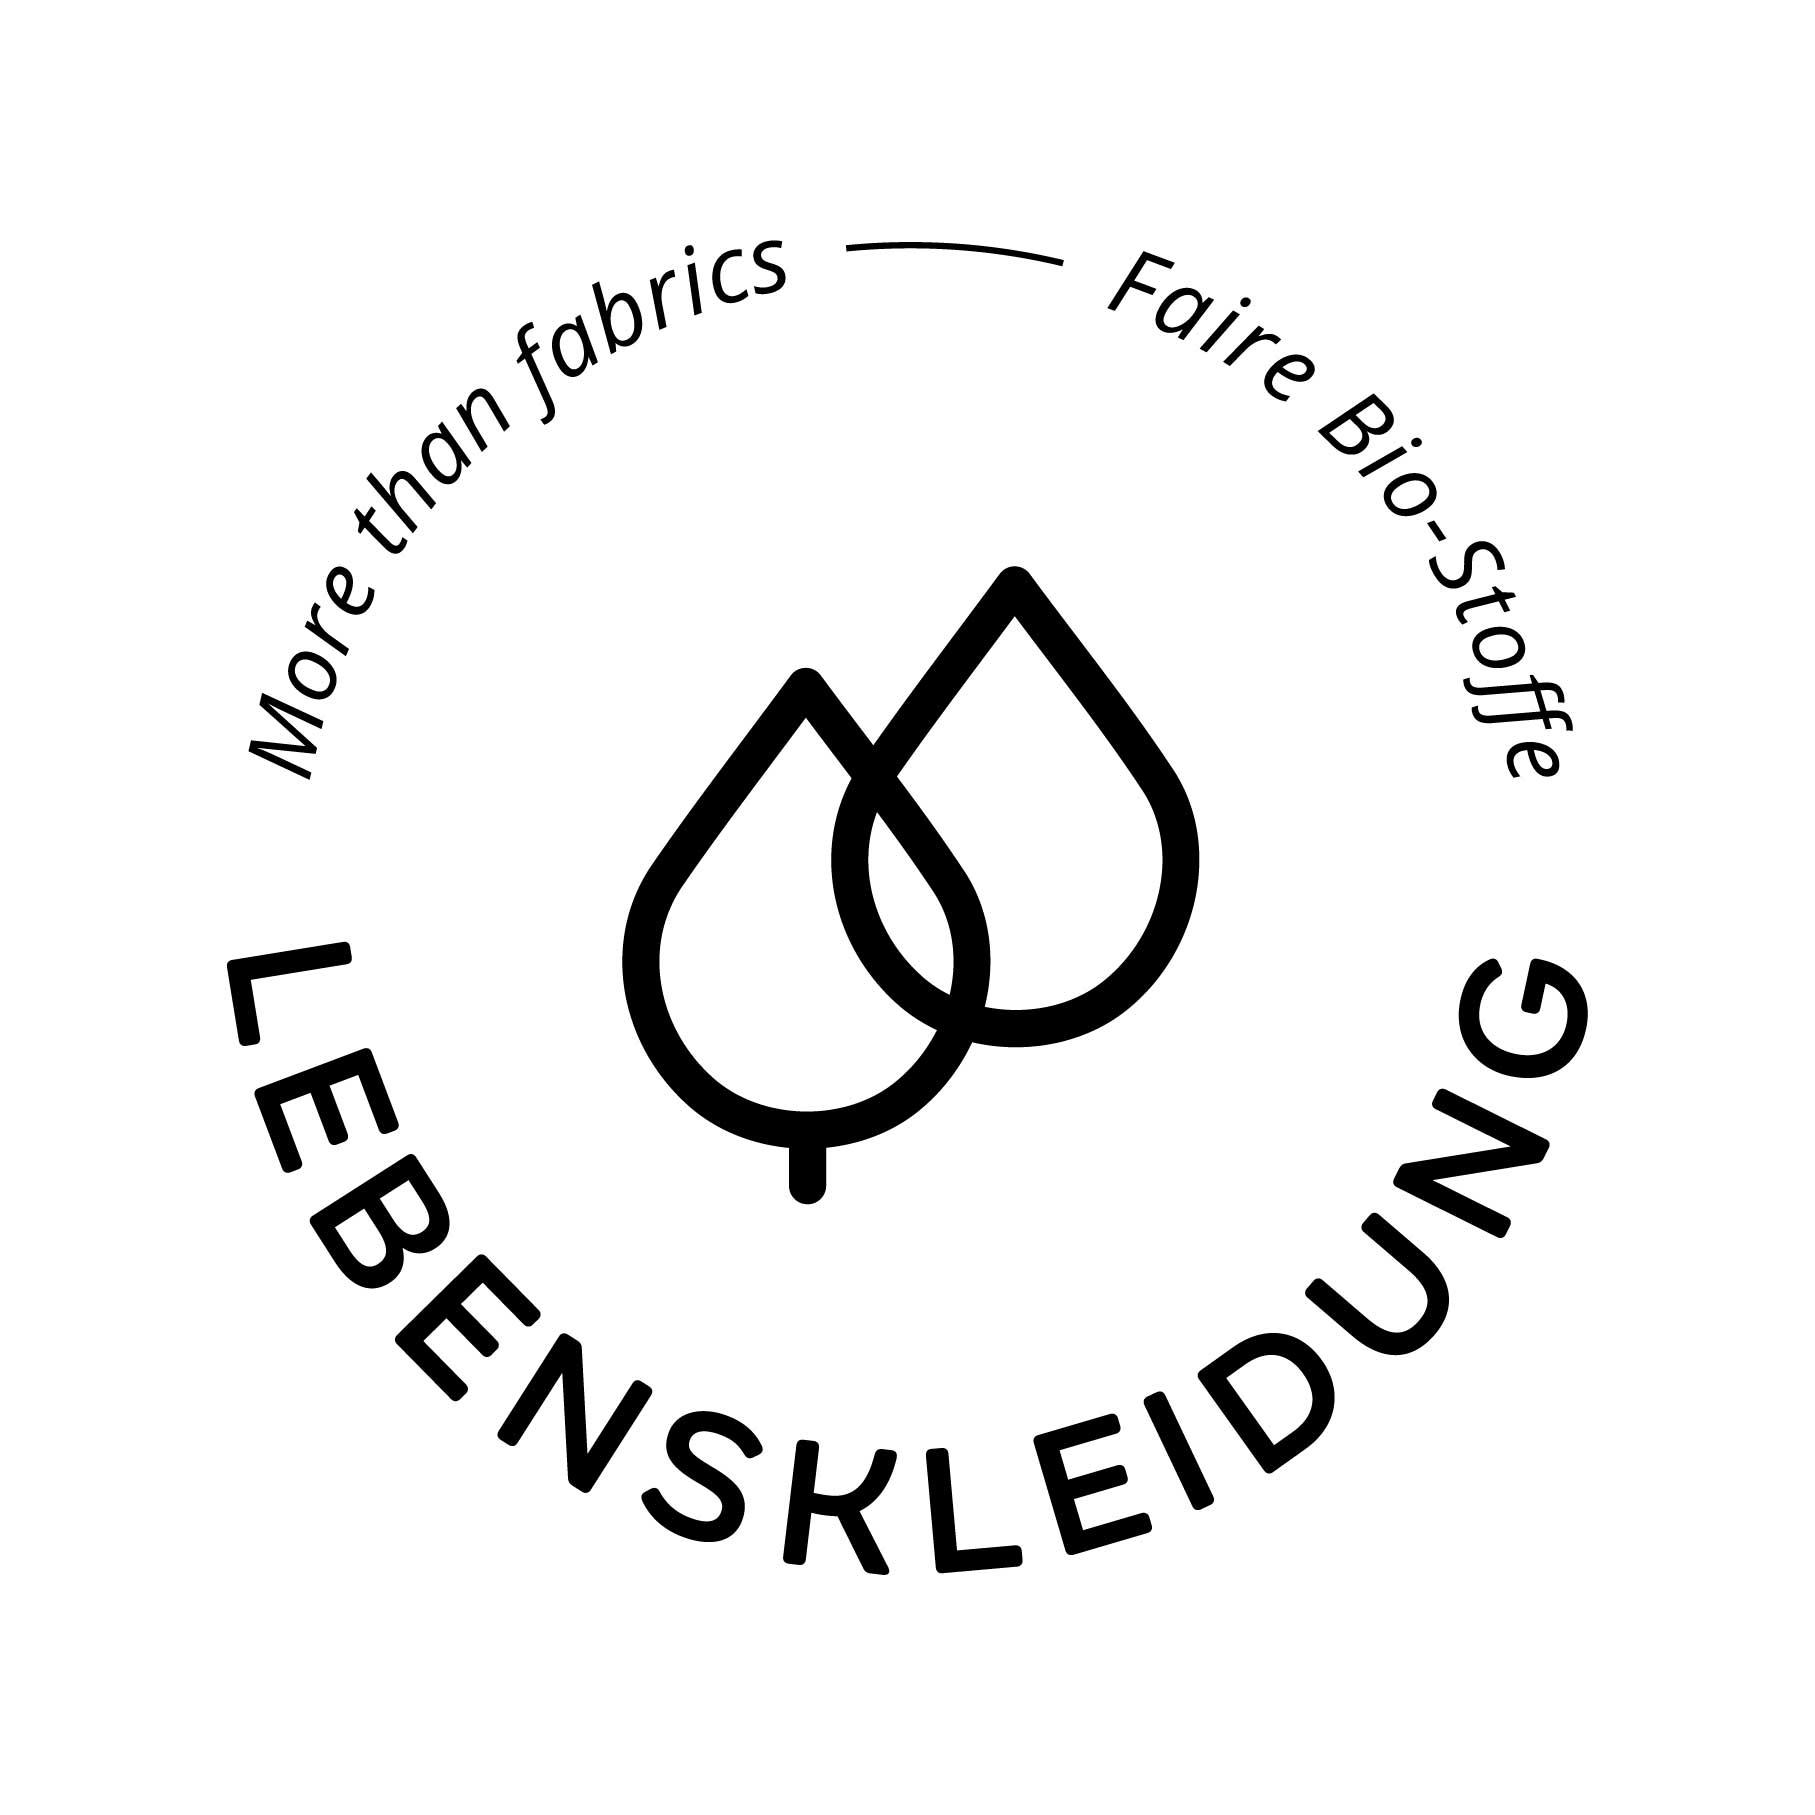 Tela orgánica RIB 2x1 (Puños) Tela - Copper Marl-1